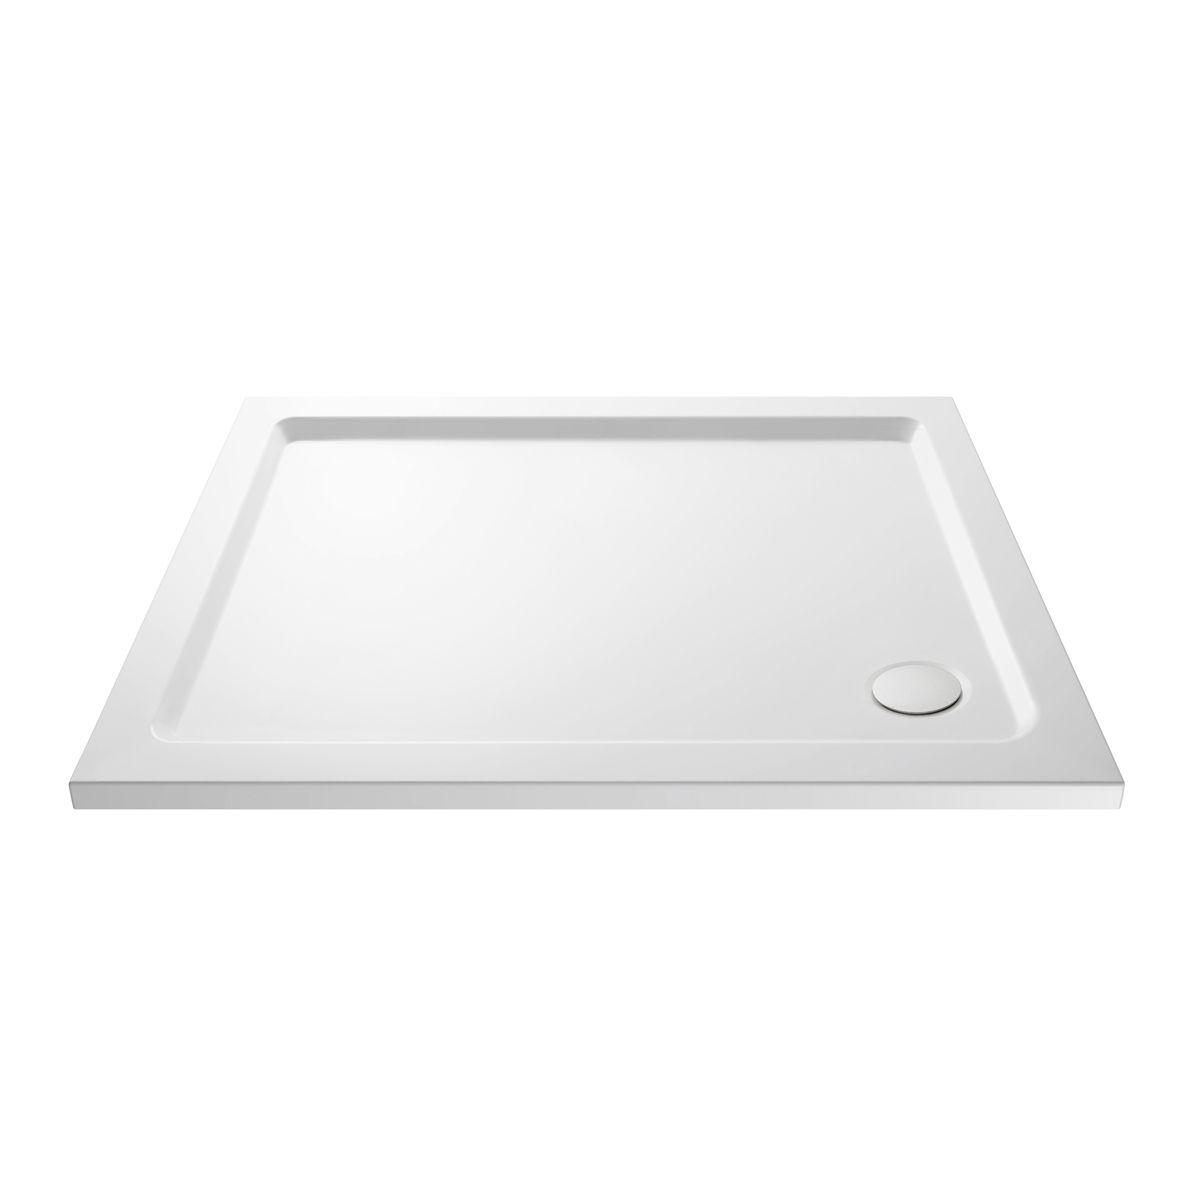 Cassellie Rectangular Shower Tray 1200 x 900mm